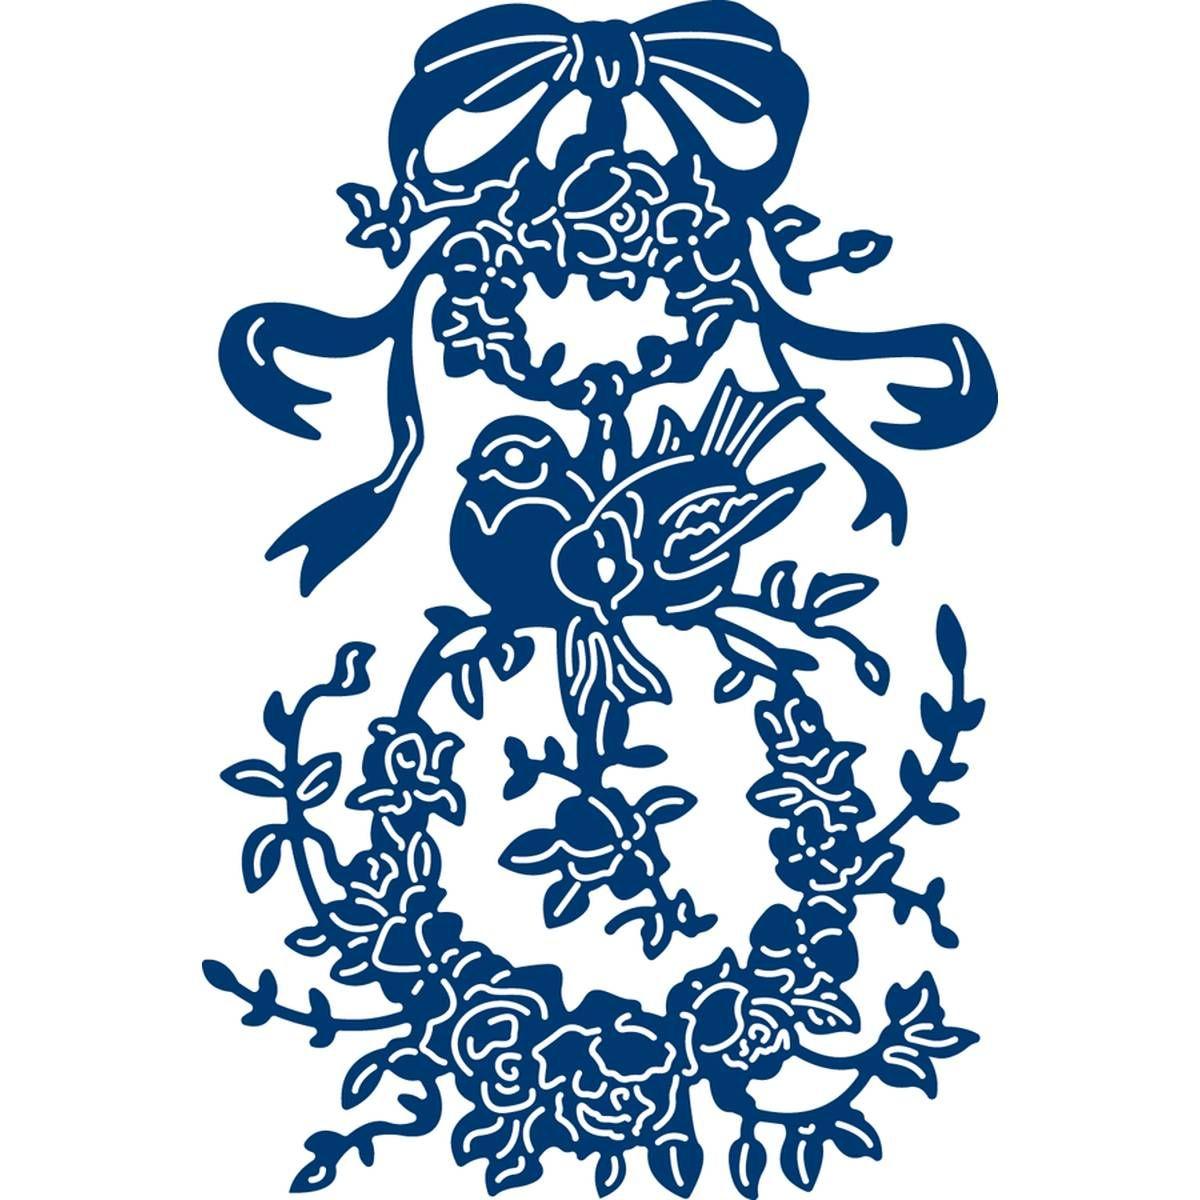 Tattered lace die /'Delicate mermaid/' cutting die NEW sizzix big shot xcut